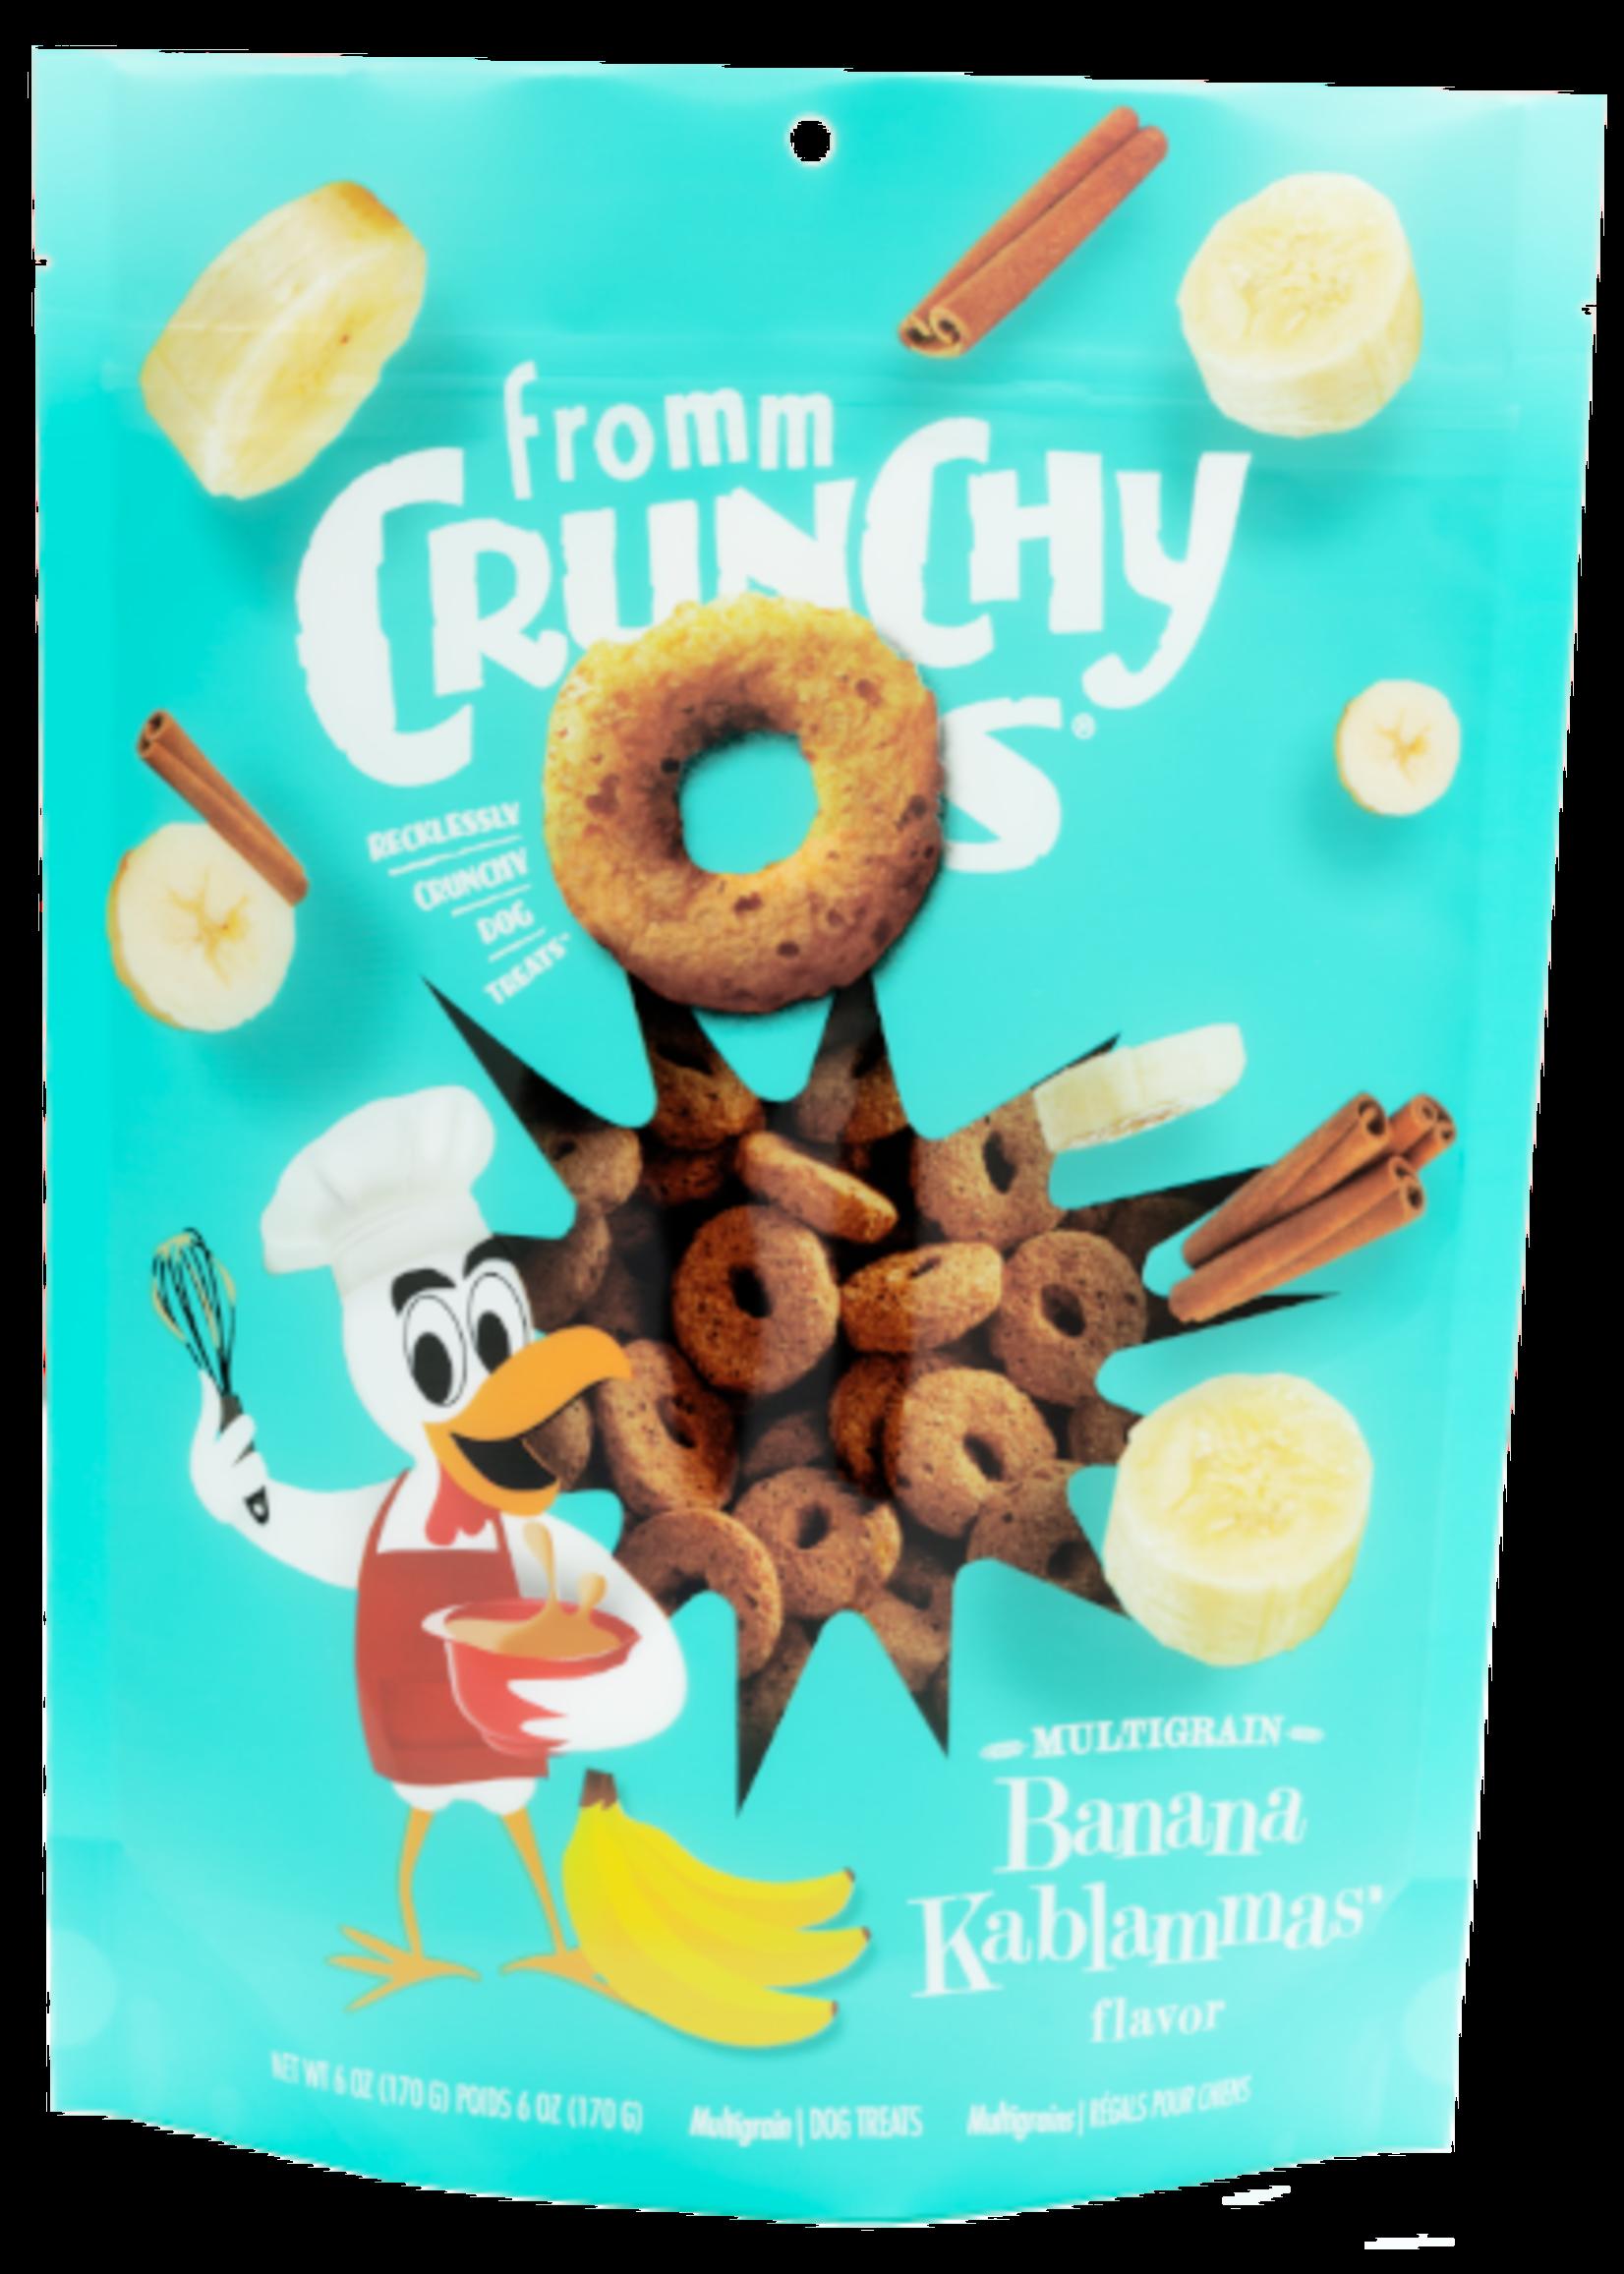 Fromm Fromm Crunchy Os Banana Kablammas® 6oz